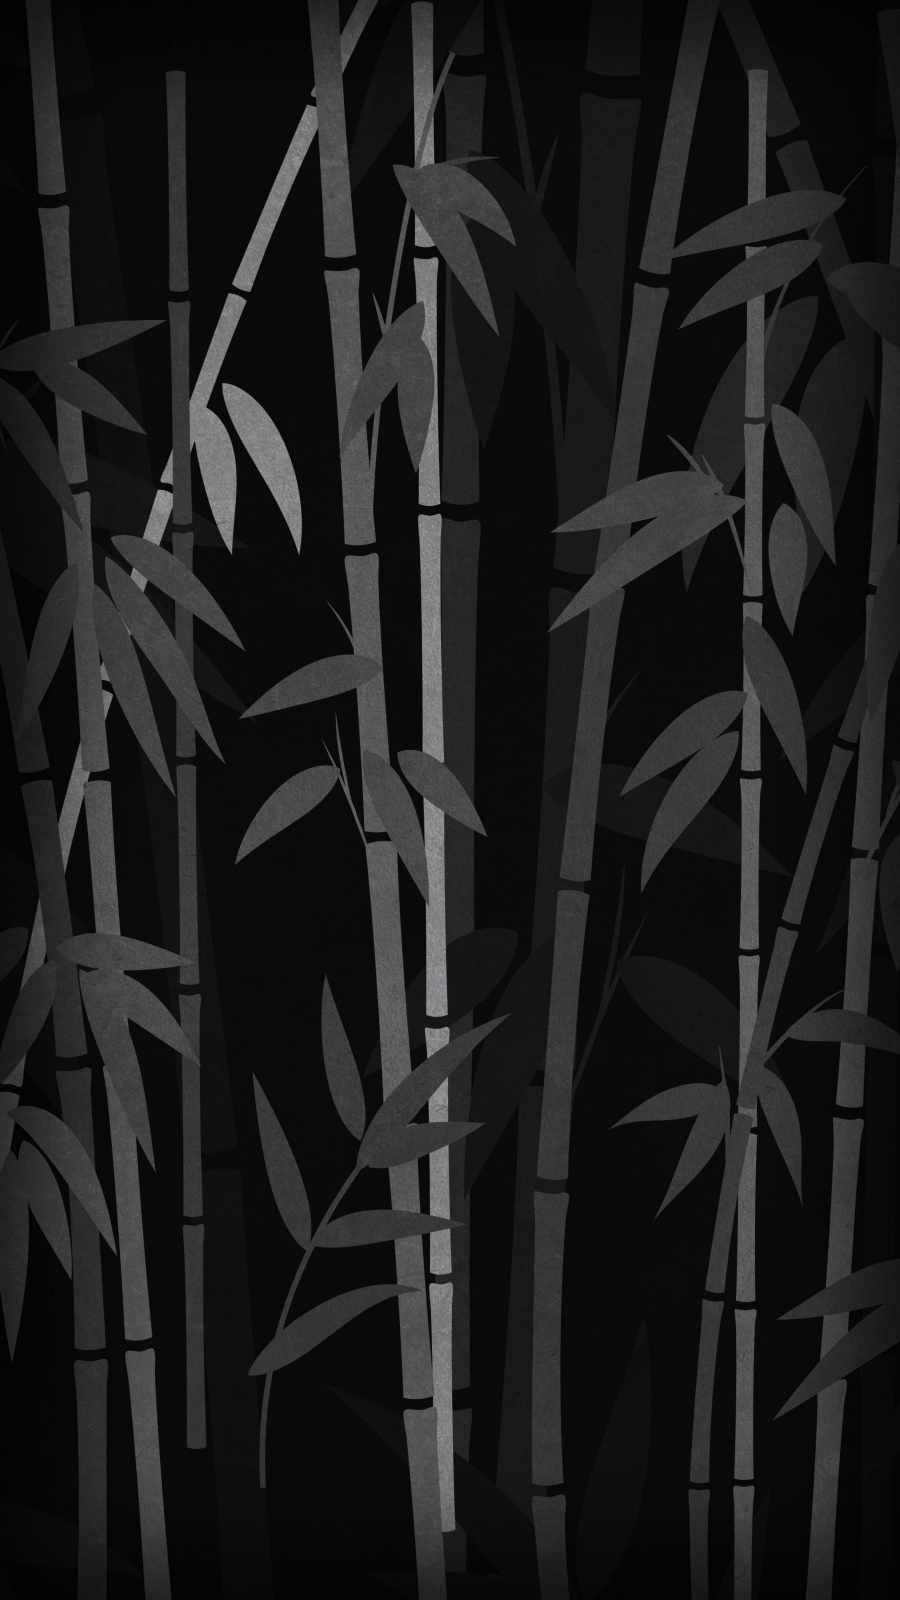 Bamboo Trees Minimal